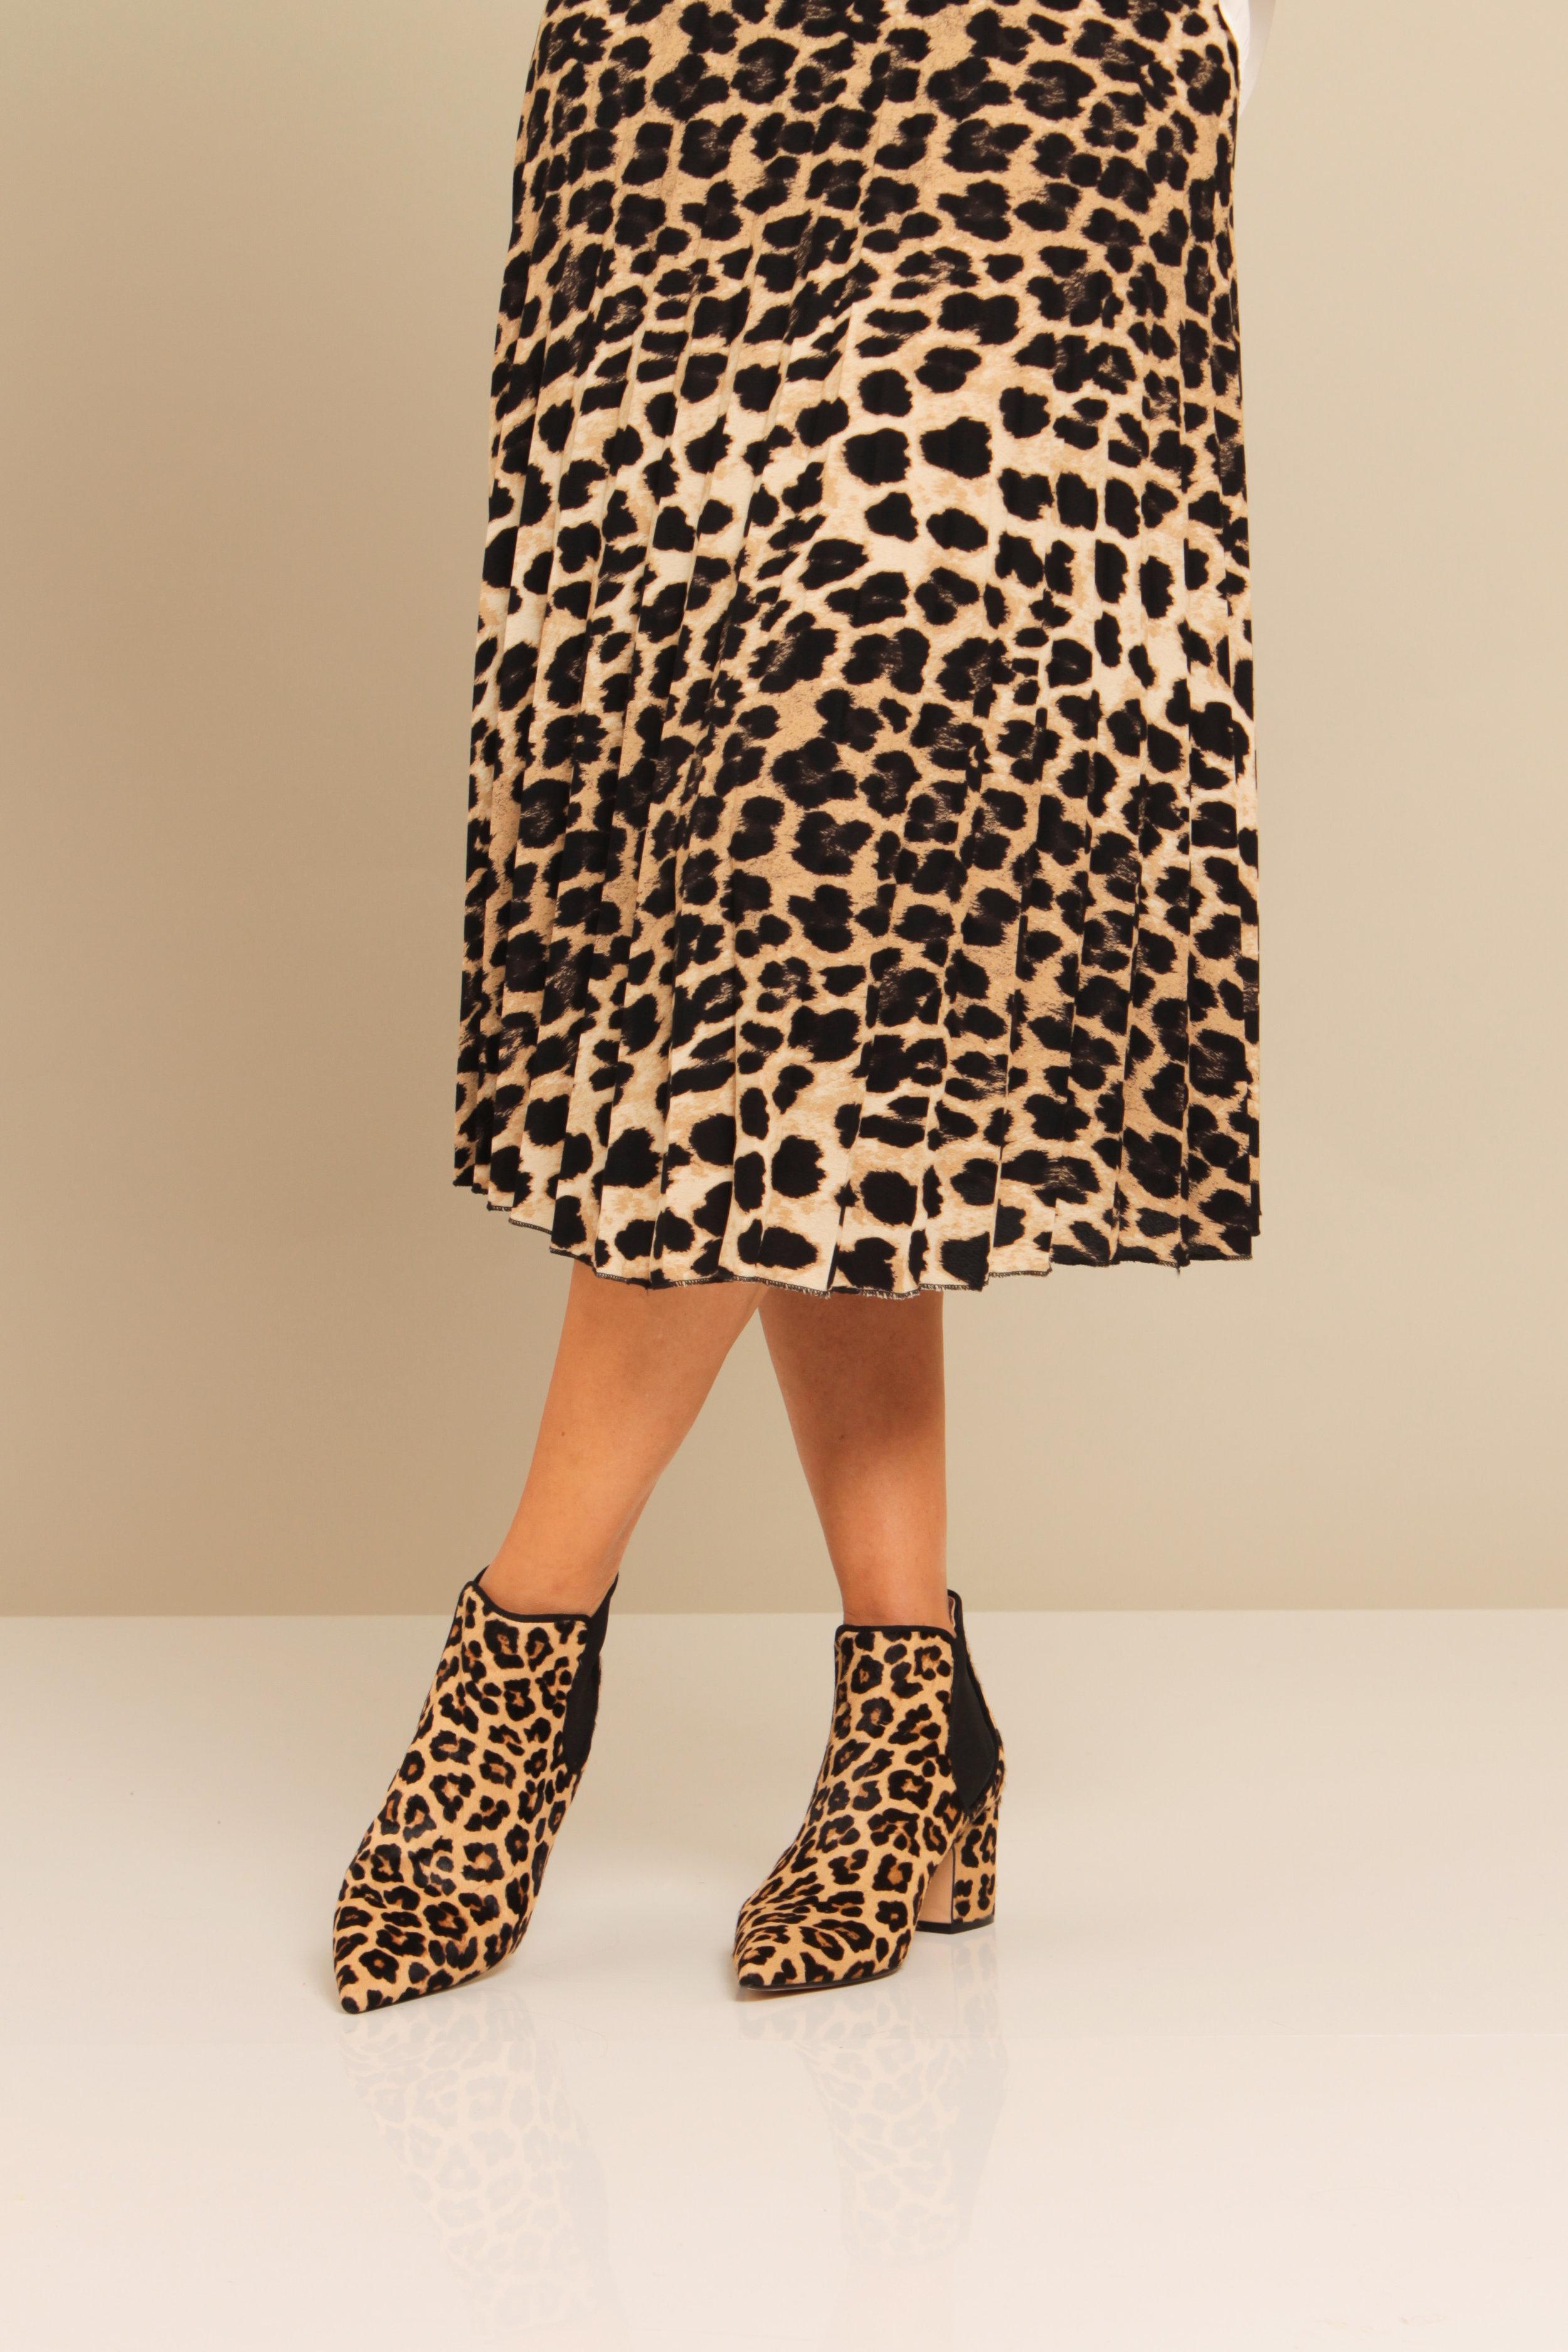 Boots: £95.99  Zara